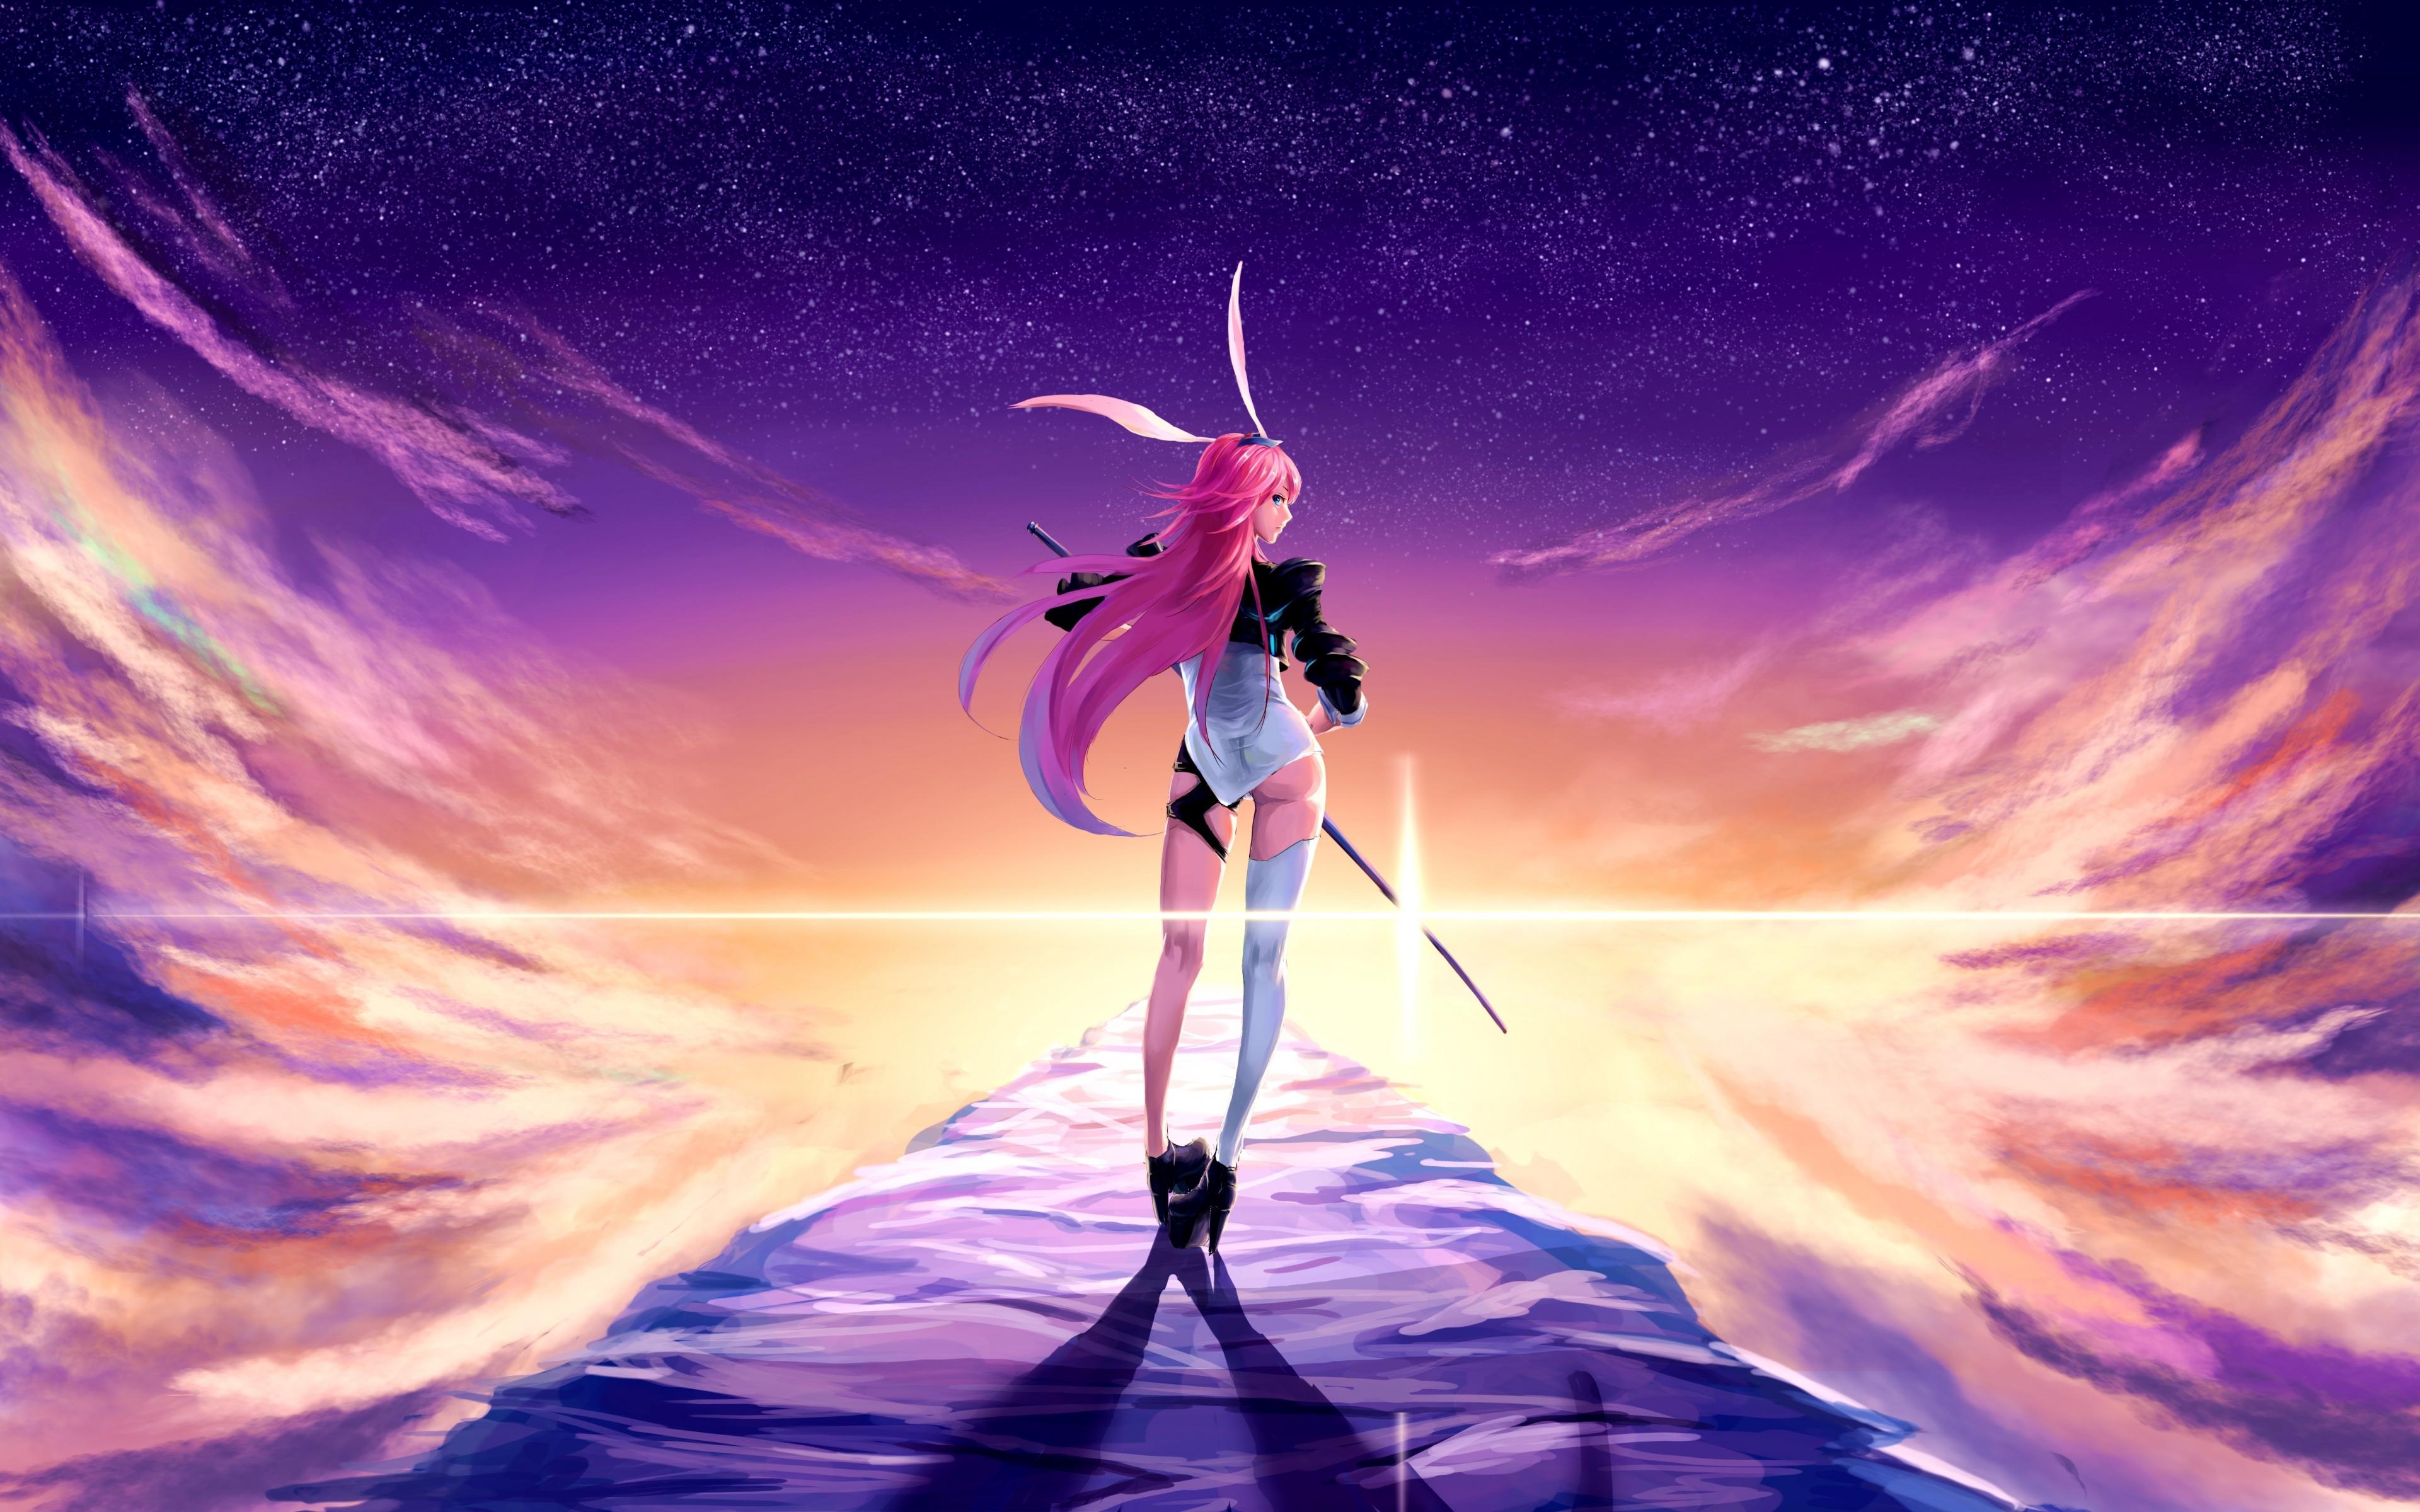 Download 3840x2400 wallpaper valkyrja, anime girl, warrior ...